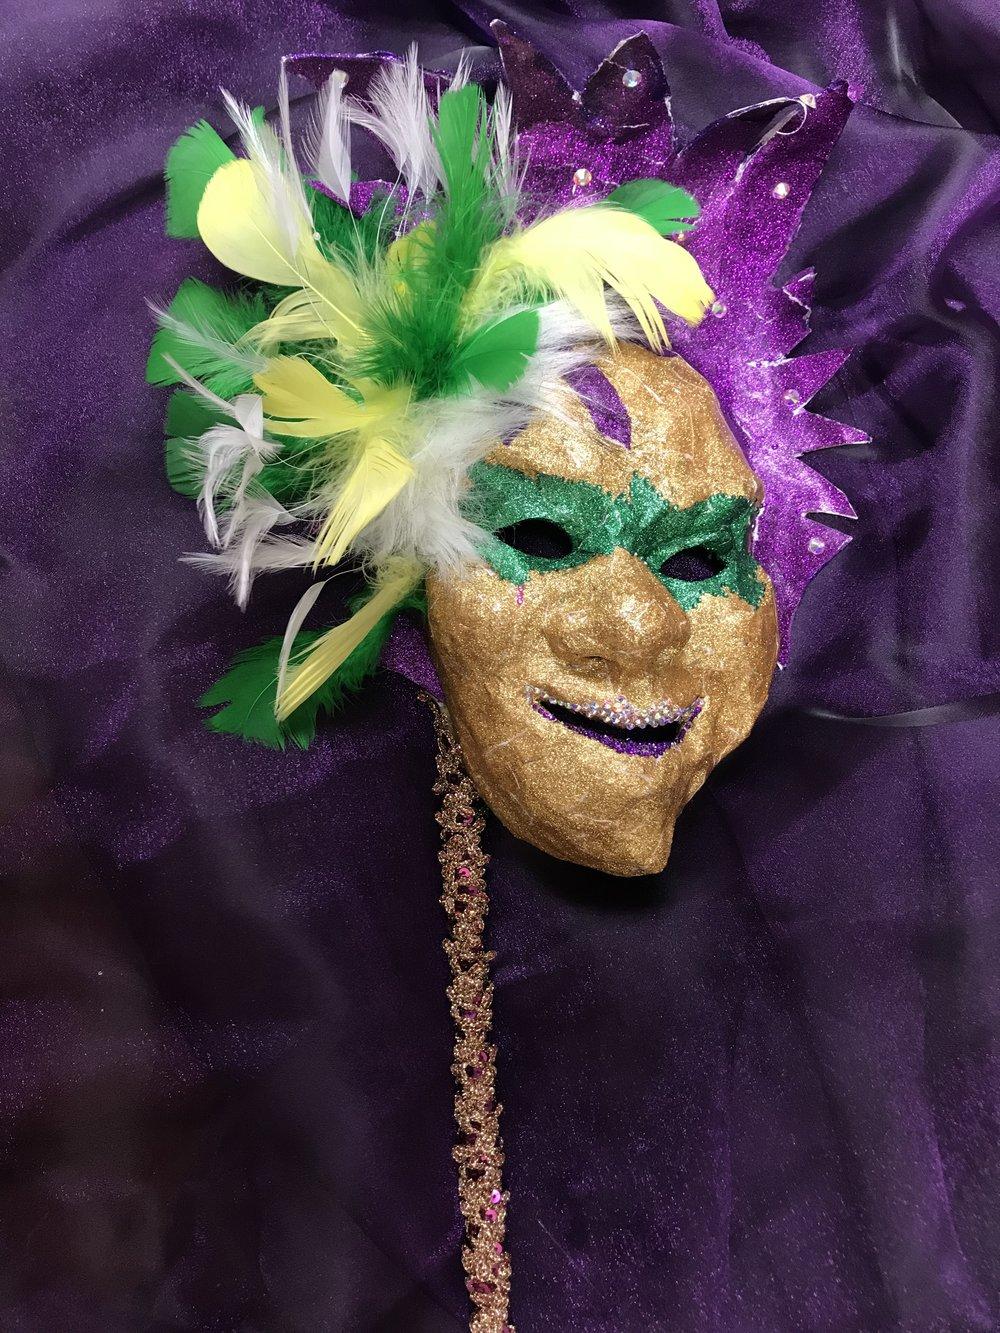 #12 Cheryl Metcalf - Mardi Gras 10